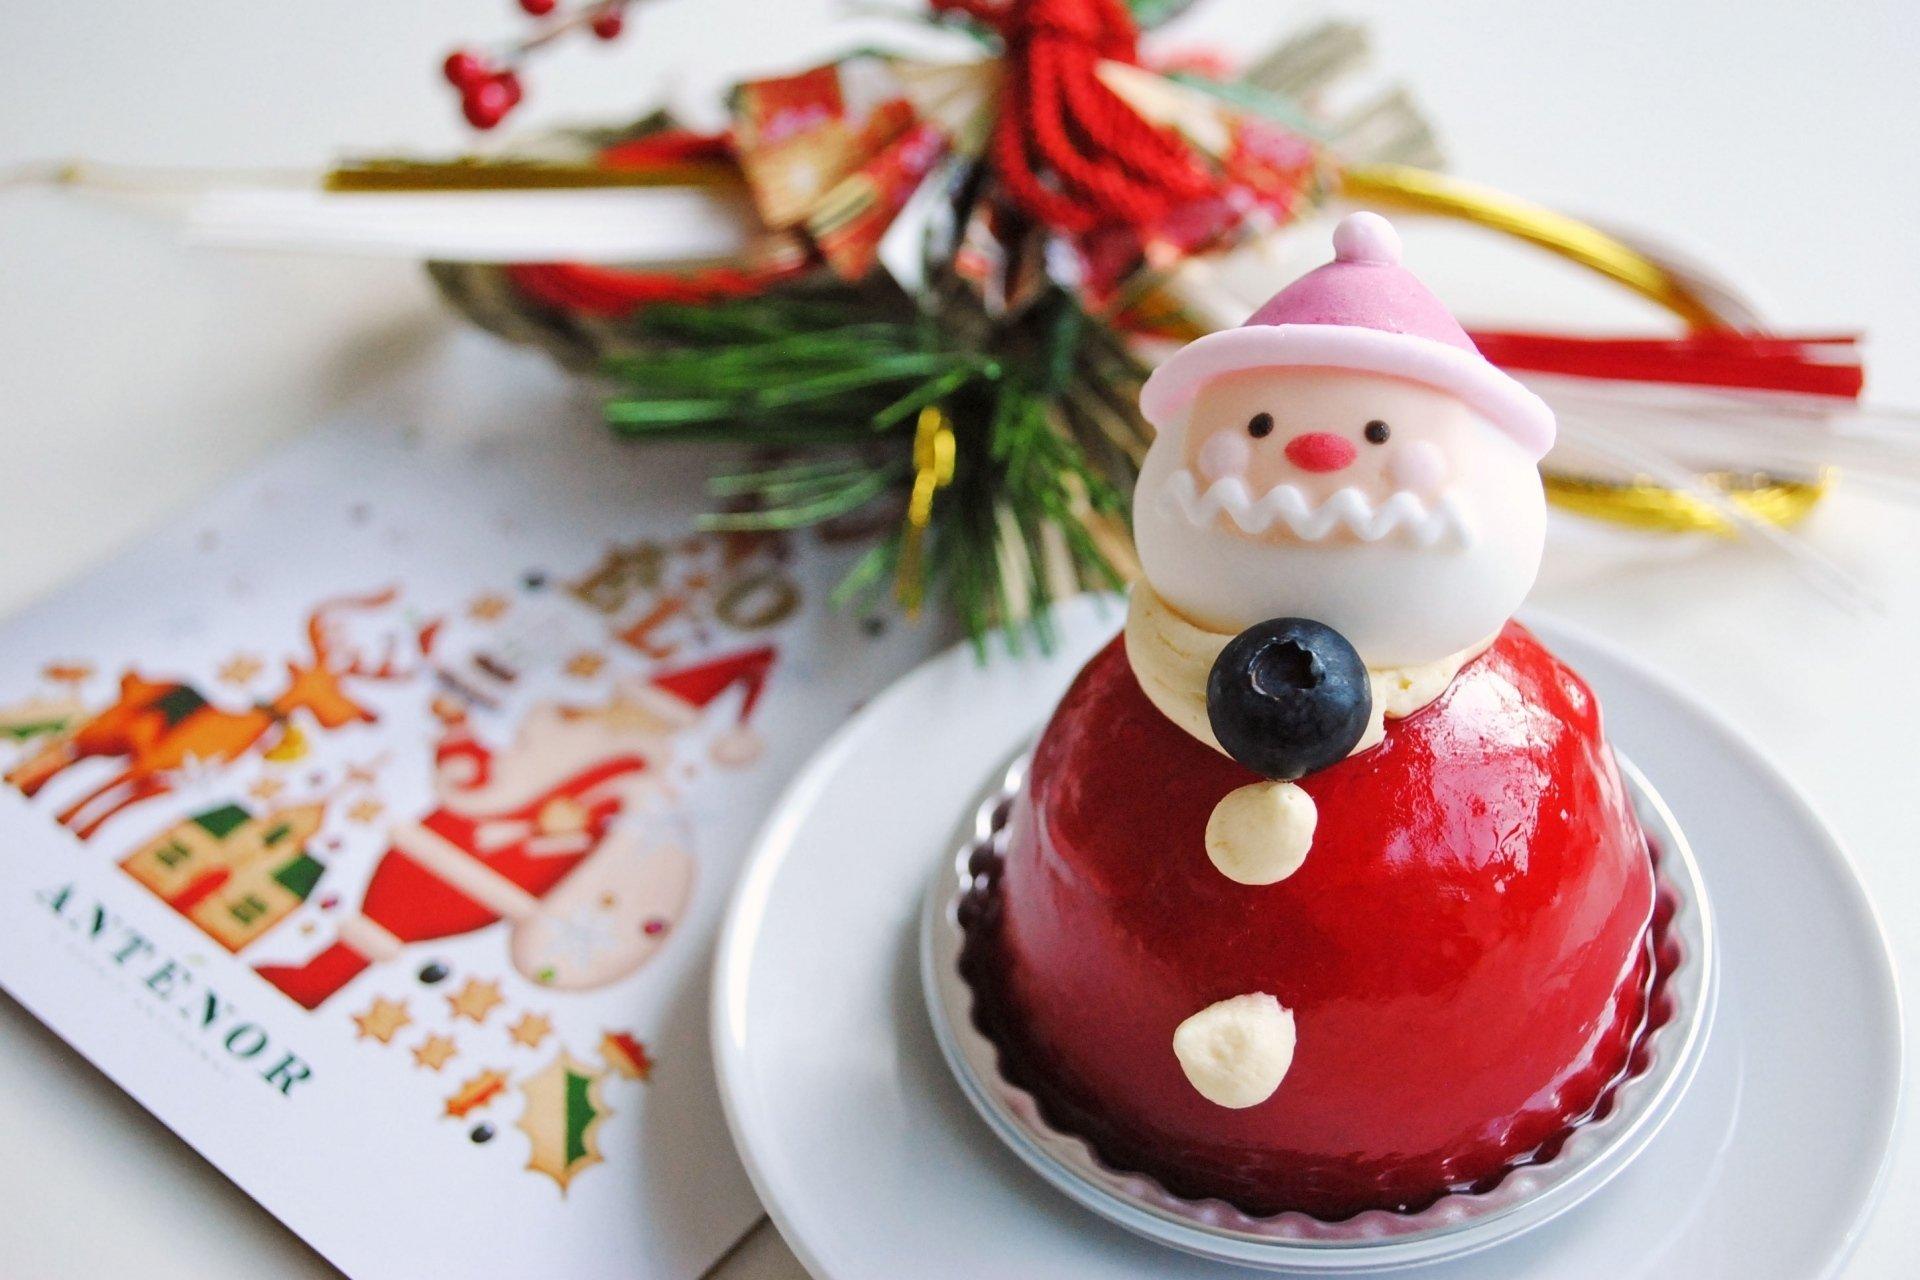 Food - Cake  Santa Claus Christmas Wallpaper